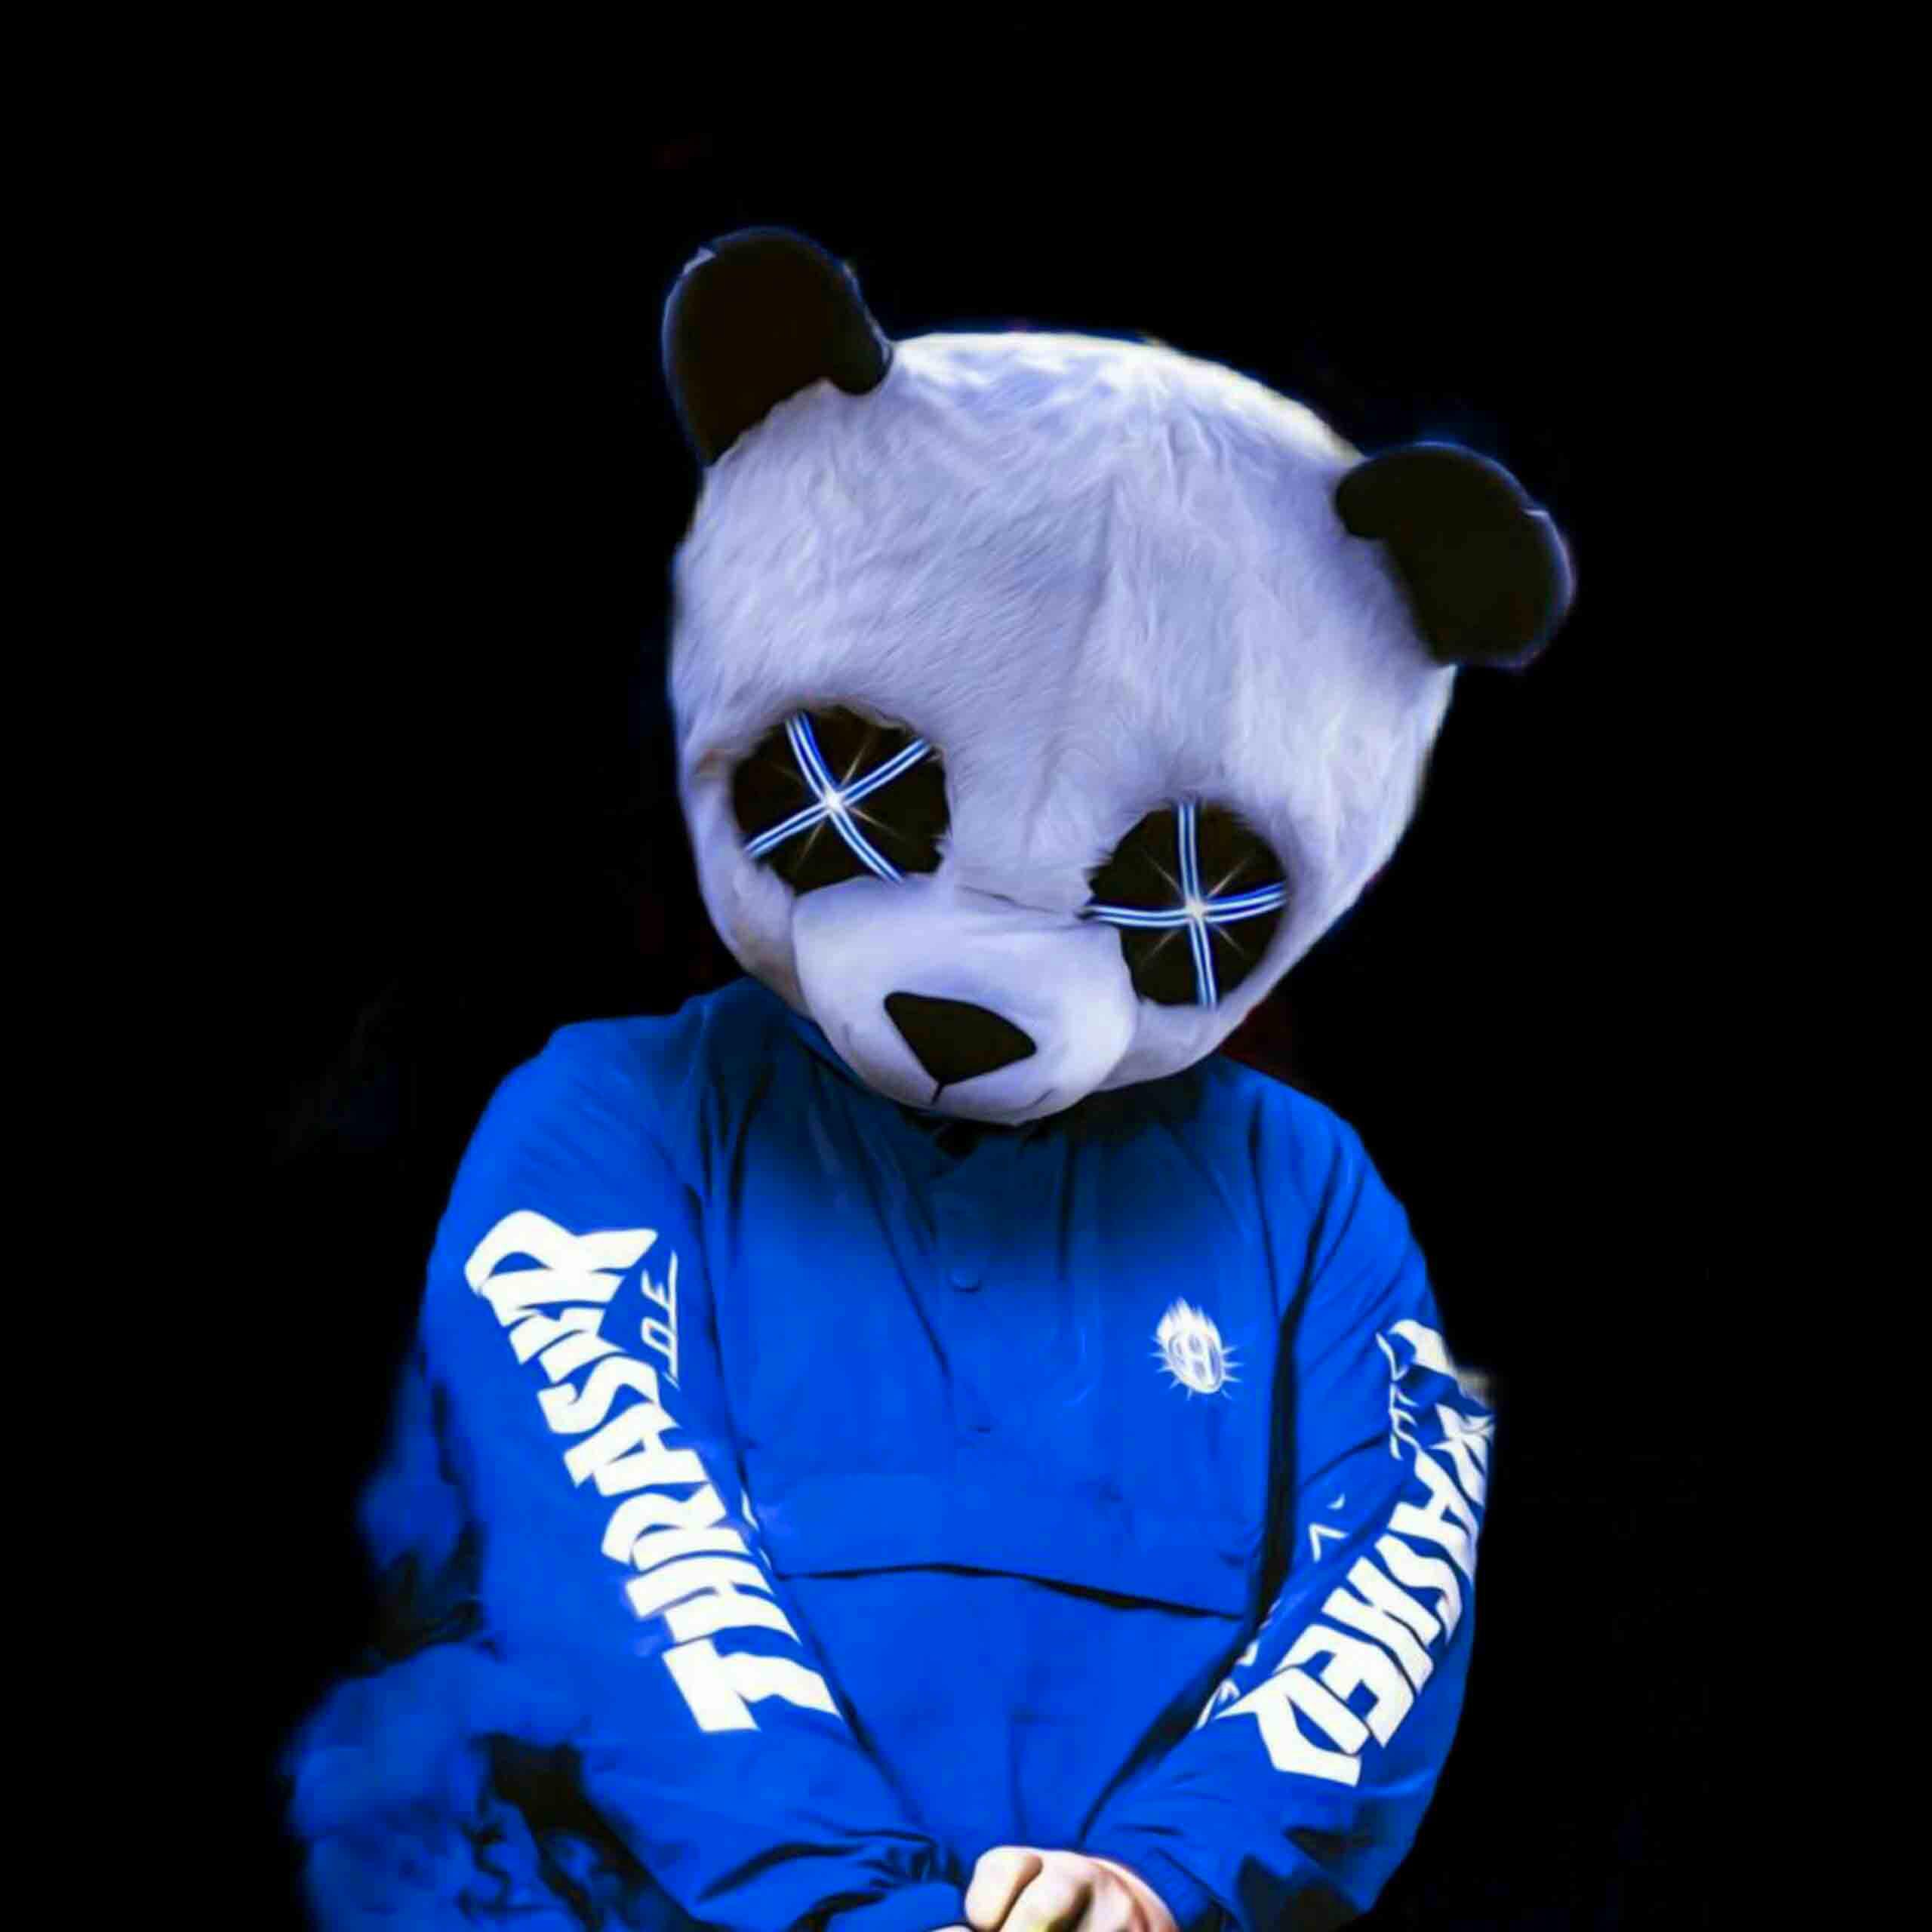 panda download 4k Uniqe Whatsapp Dp Images